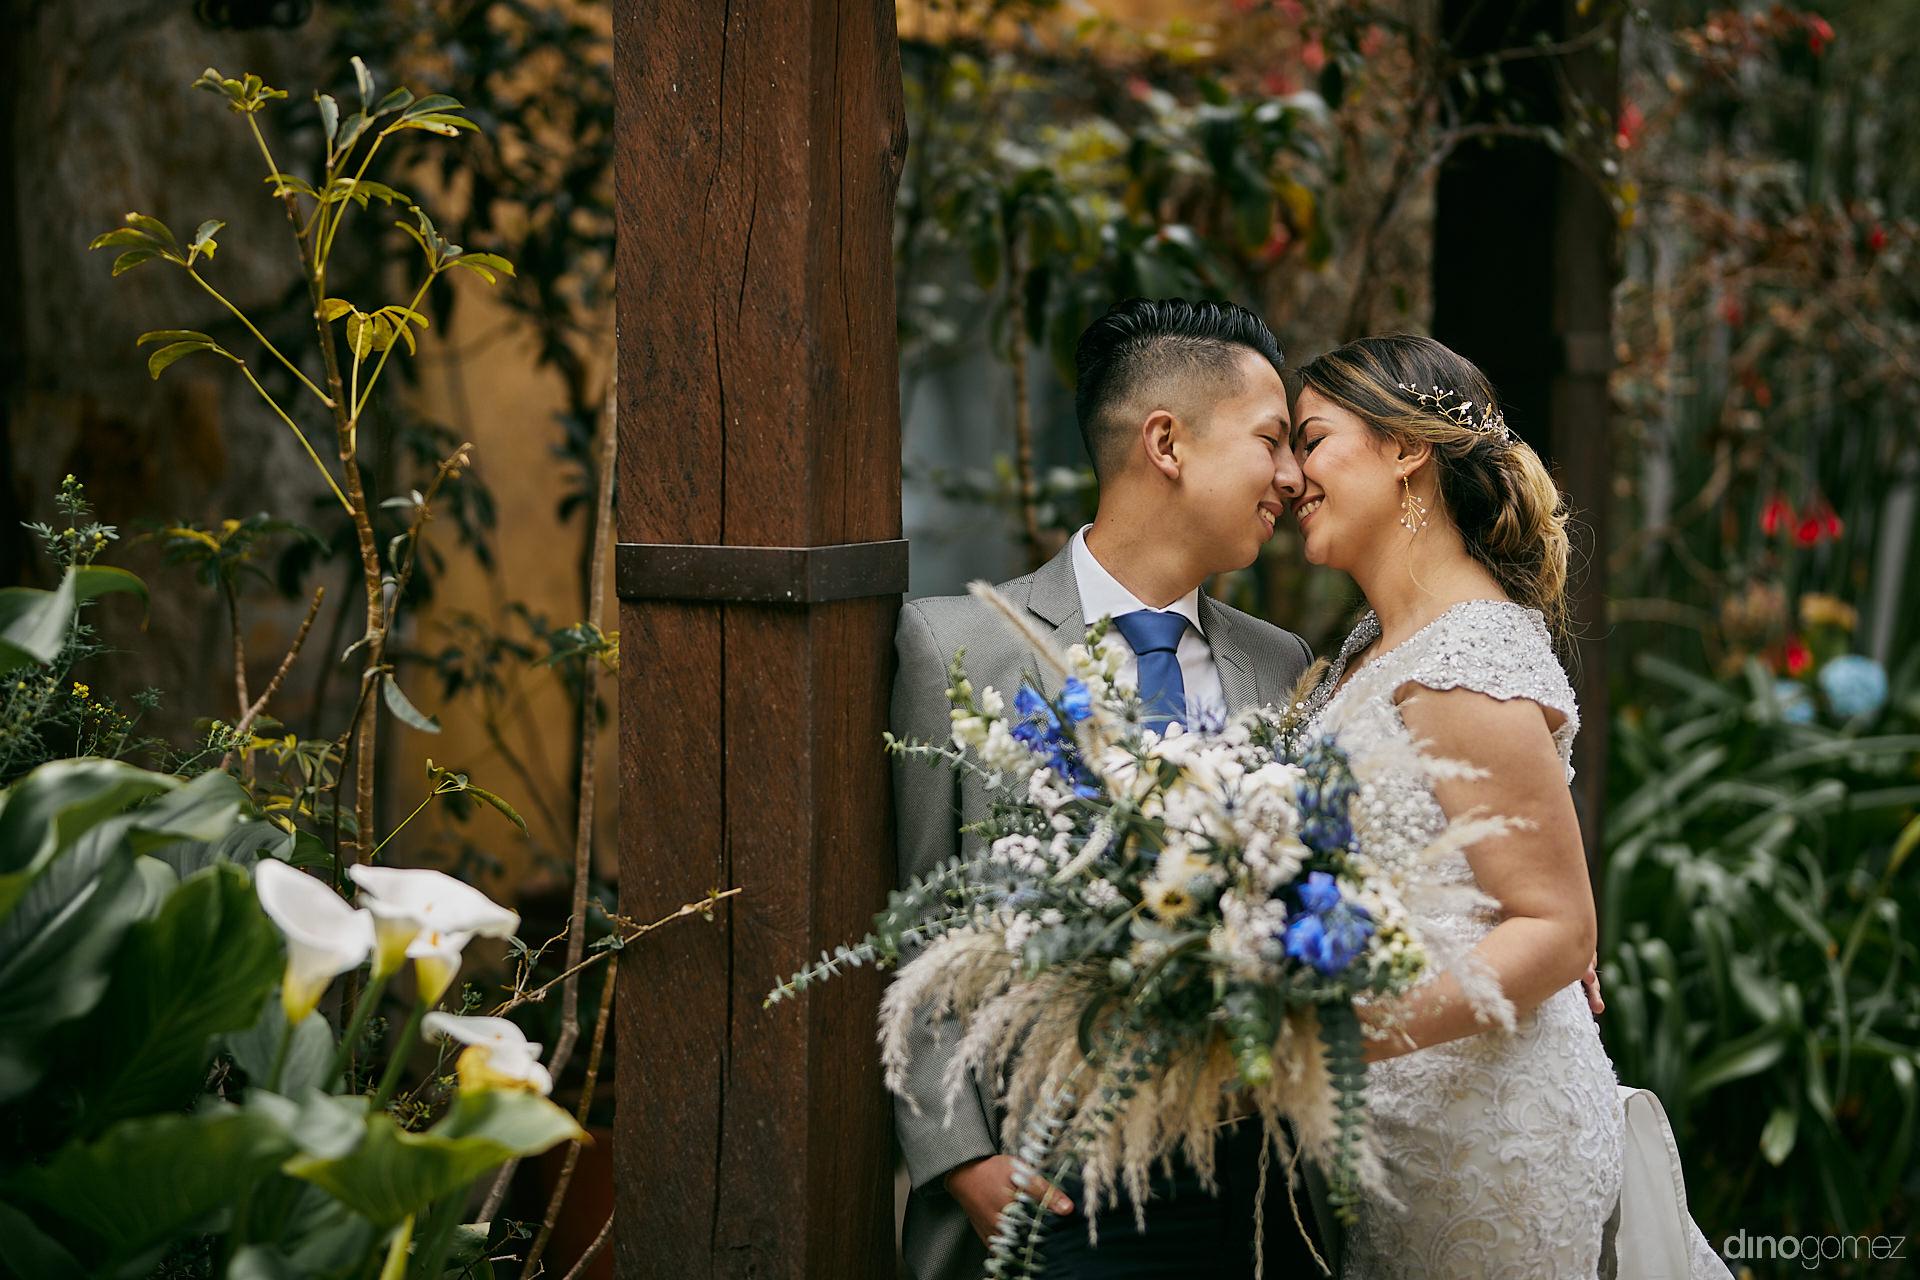 009 - Diy Budget Destination Weddings Can Be Prety Too!